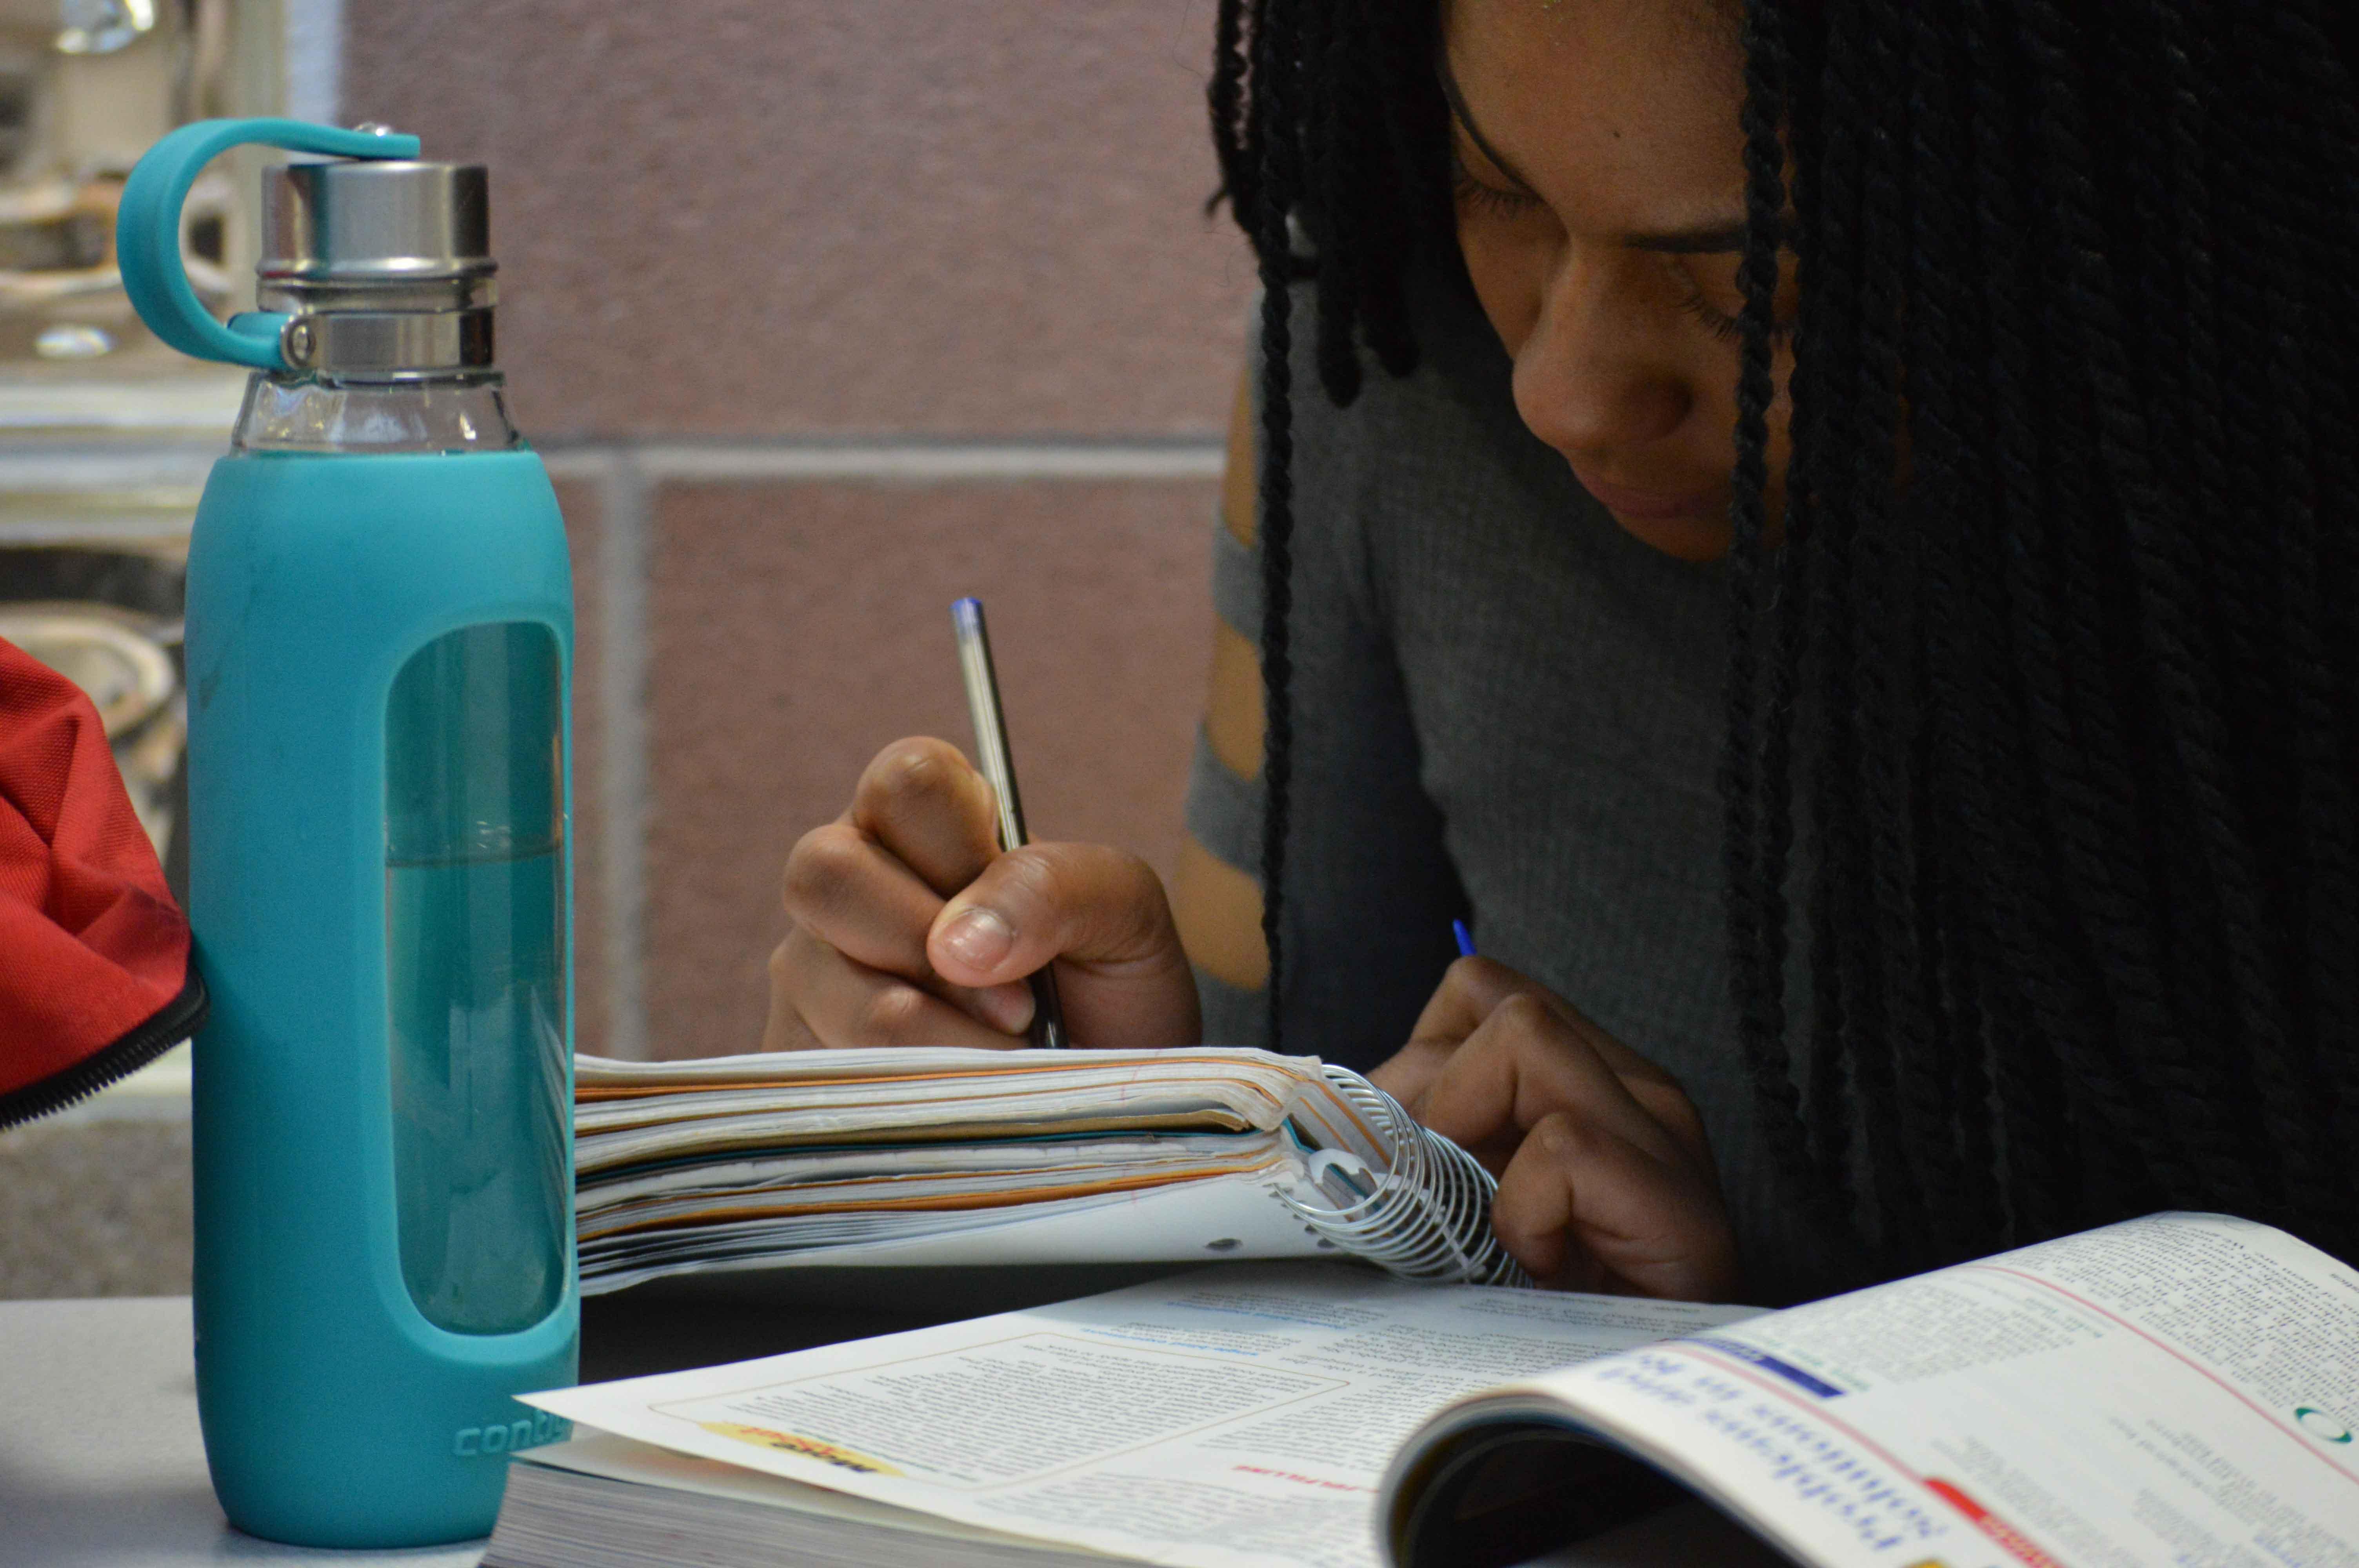 Head bent over her psychology homework, Keyana Pollard works in the science hall.